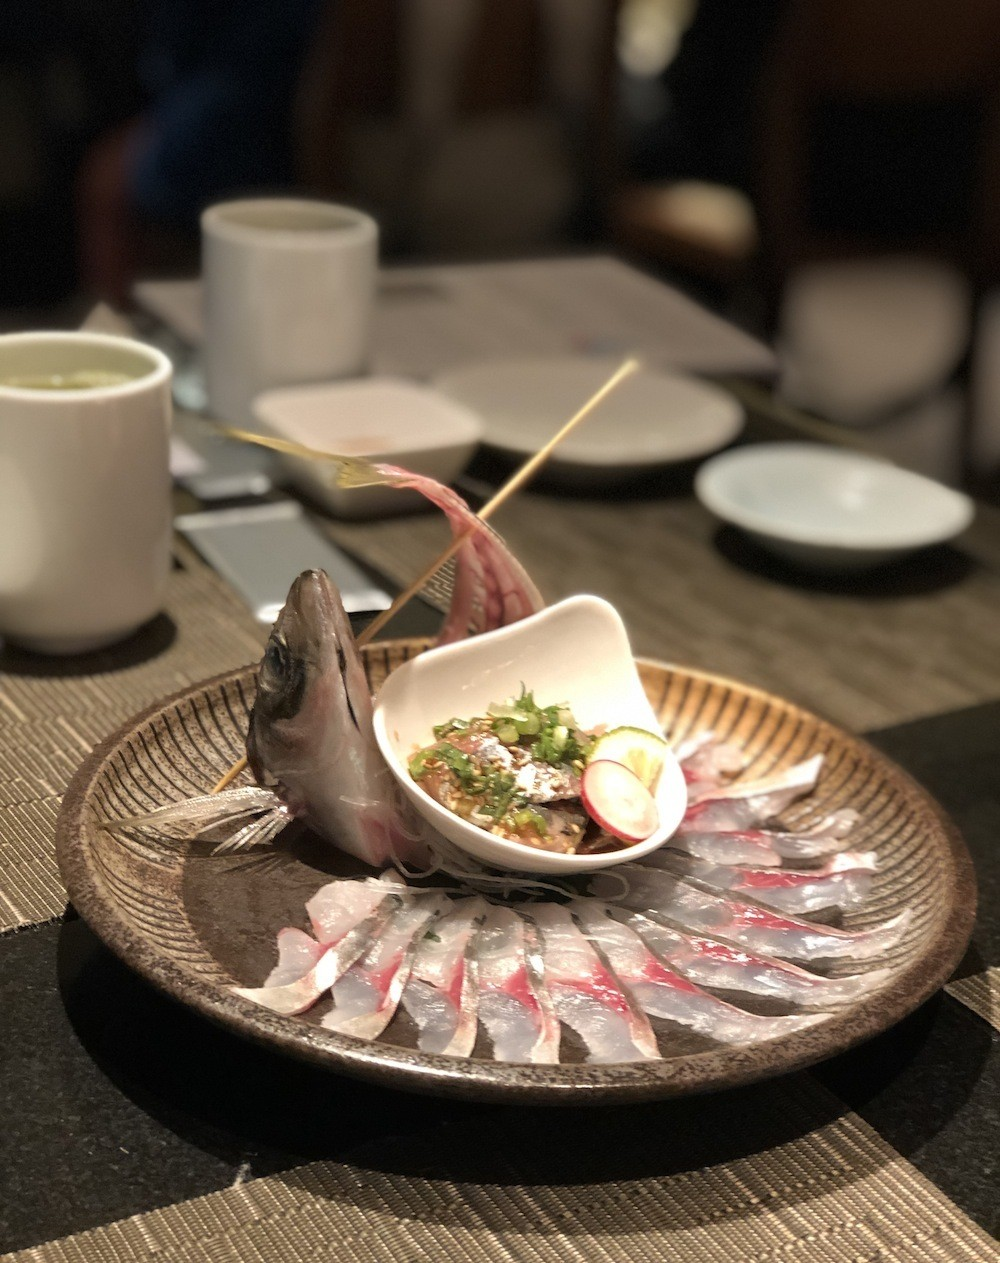 Seki aji (horse mackerel) sashimi